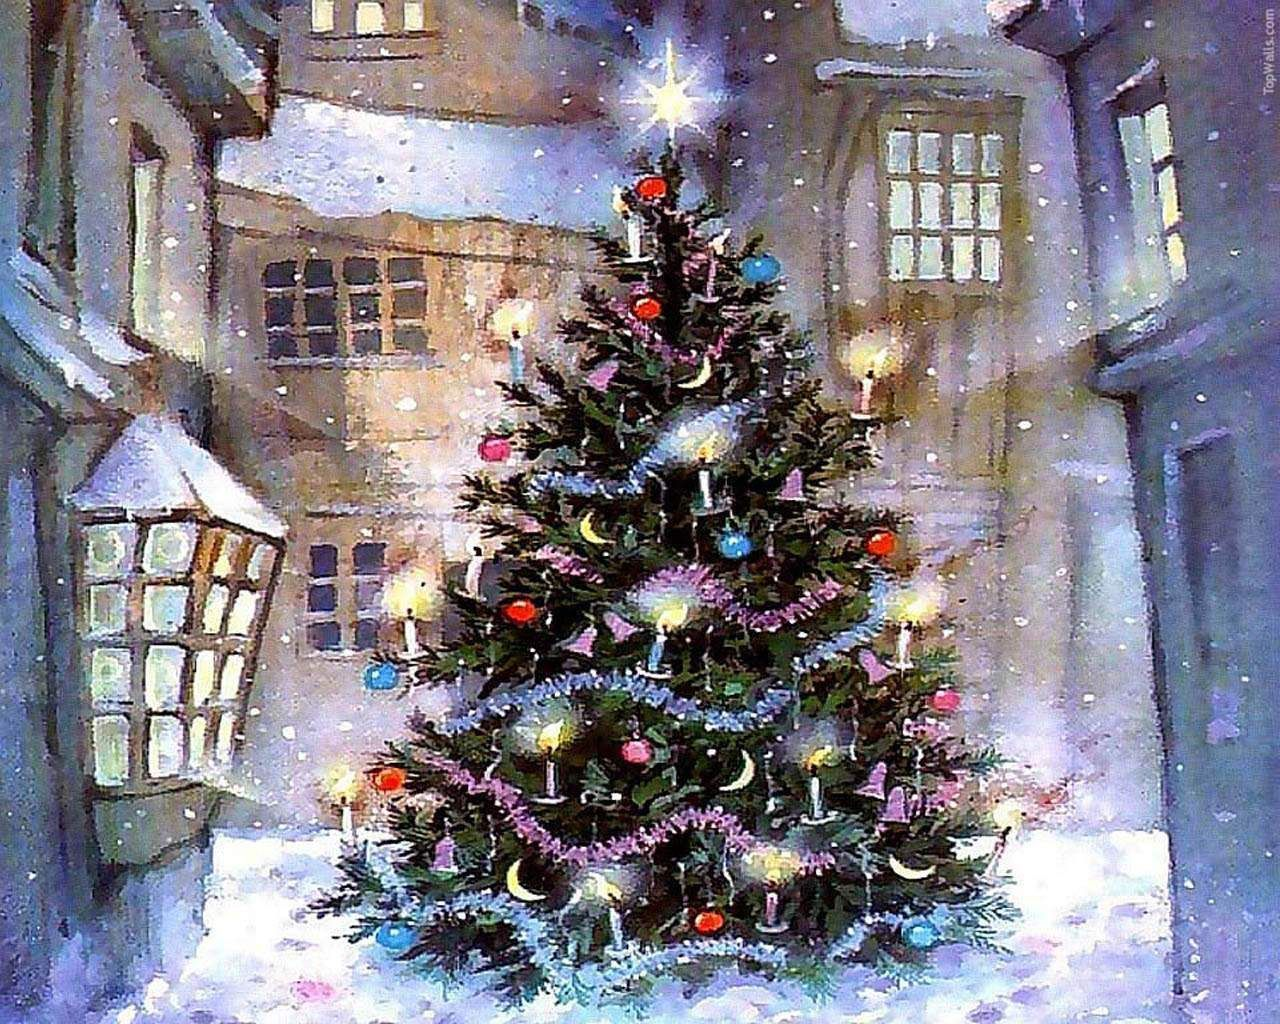 Free Christmas Wallpaper Downloads.Vintage Christmas Desktop Wallpapers Top Free Vintage